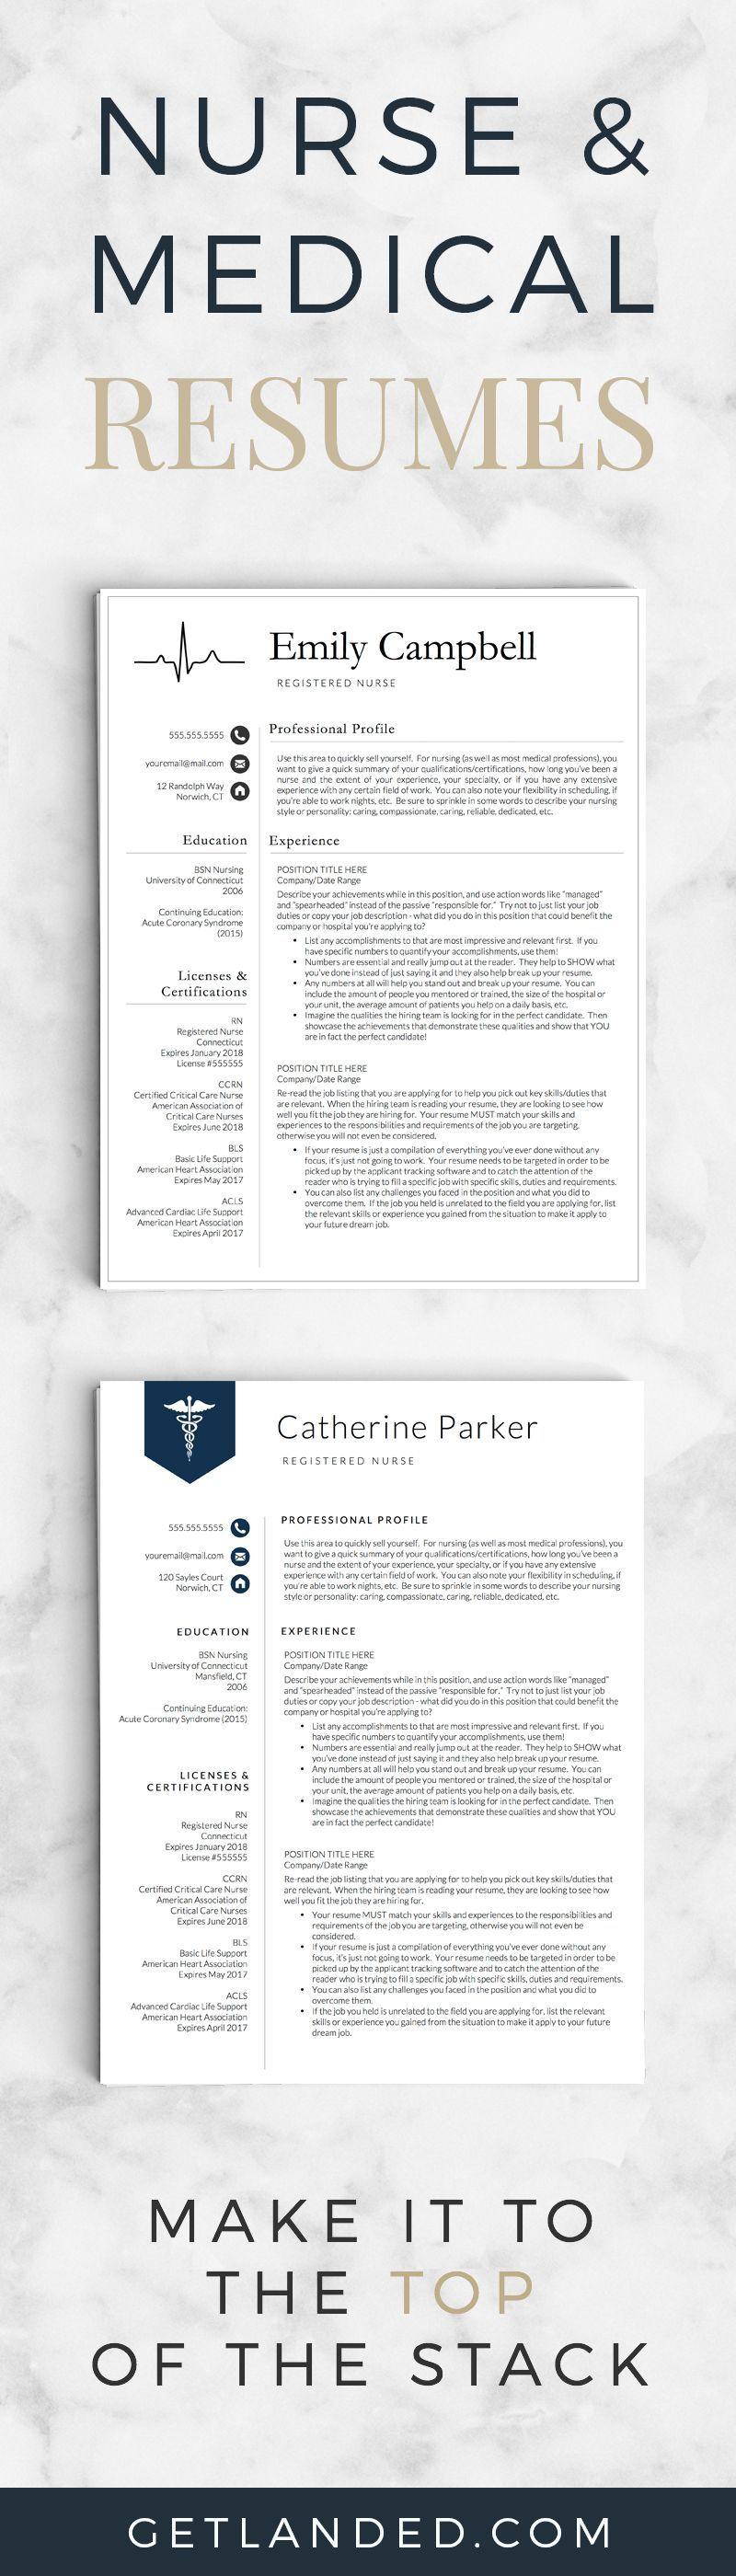 Nursing School Resume Nurse Resume Templates  Medical Resumes  Resume Templates .